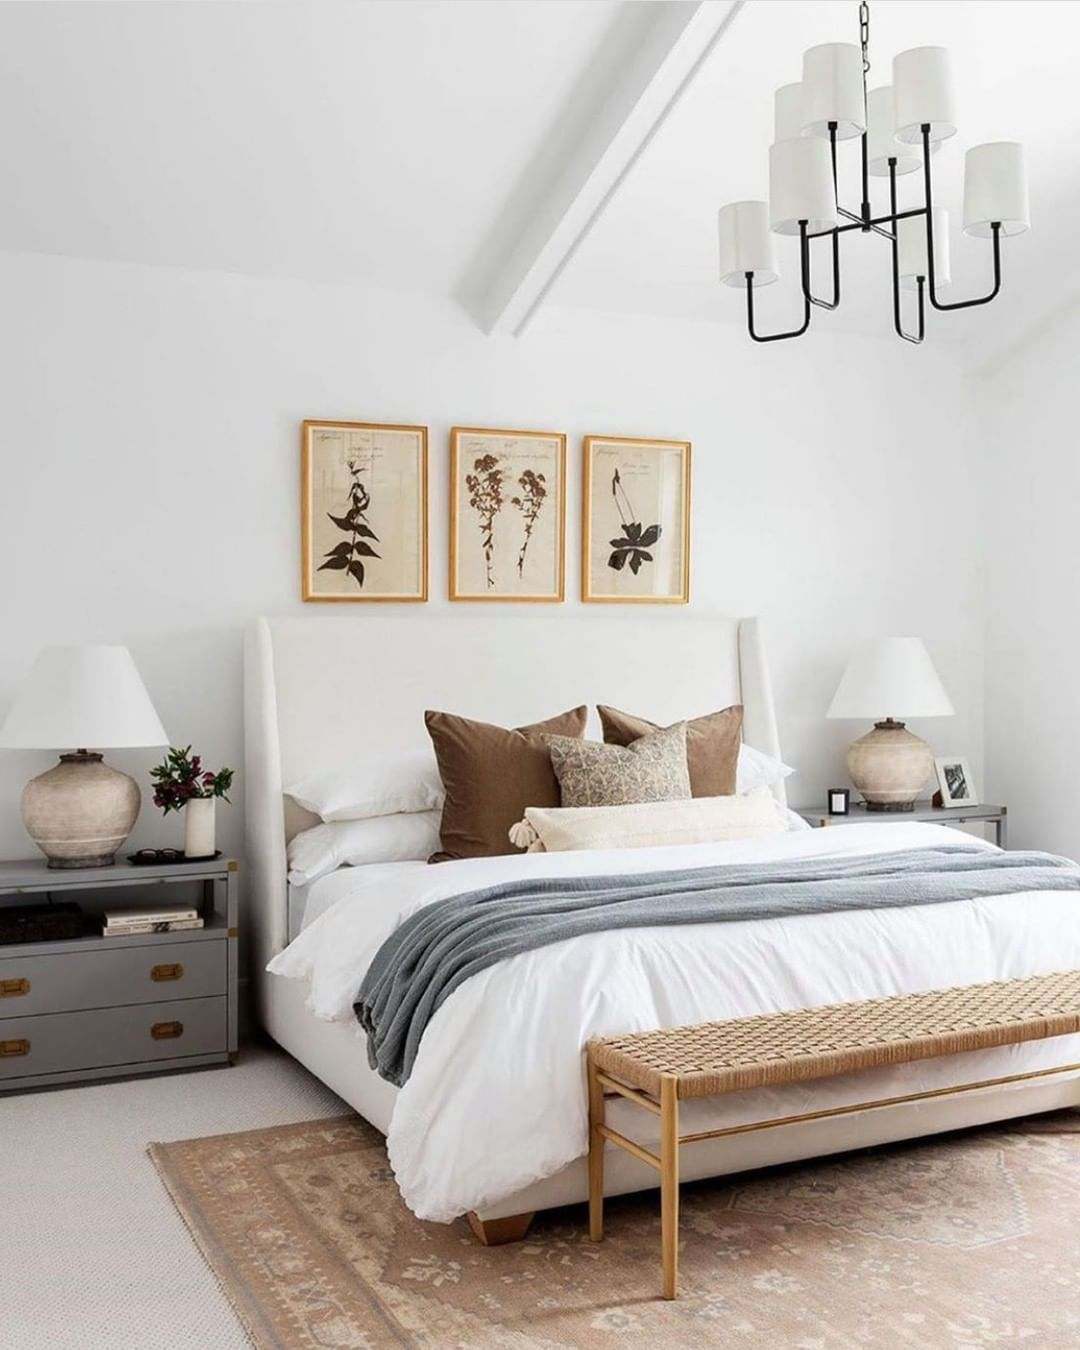 Lonny On Instagram On Saturdays We Sleep In It S A Mood Via Scandinavianhomes Photography Via Nordikspace Bedroom Interior Home Decor Home